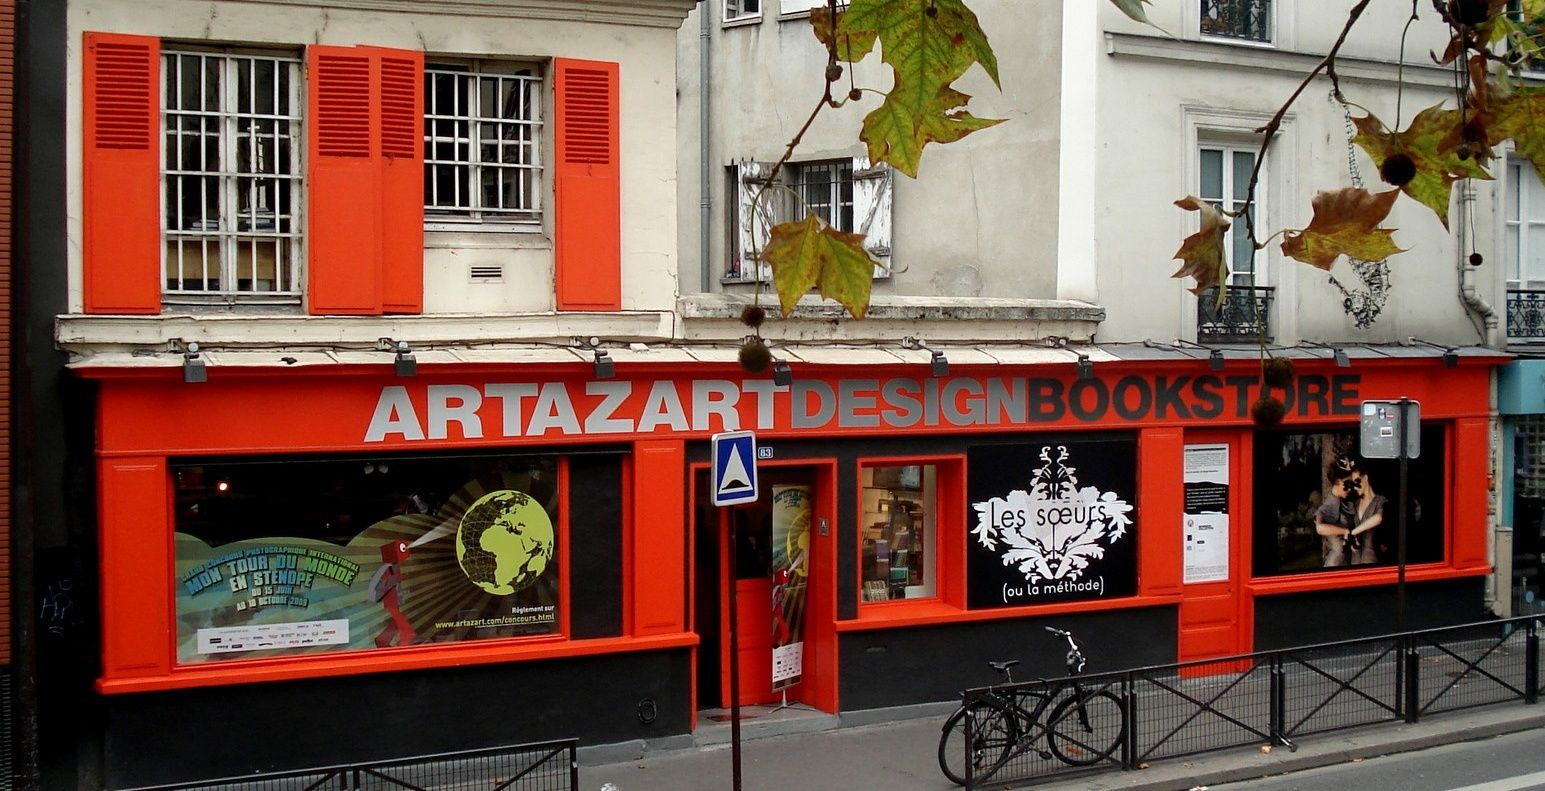 Artazart Design Bookstore Bookstore Paris Design